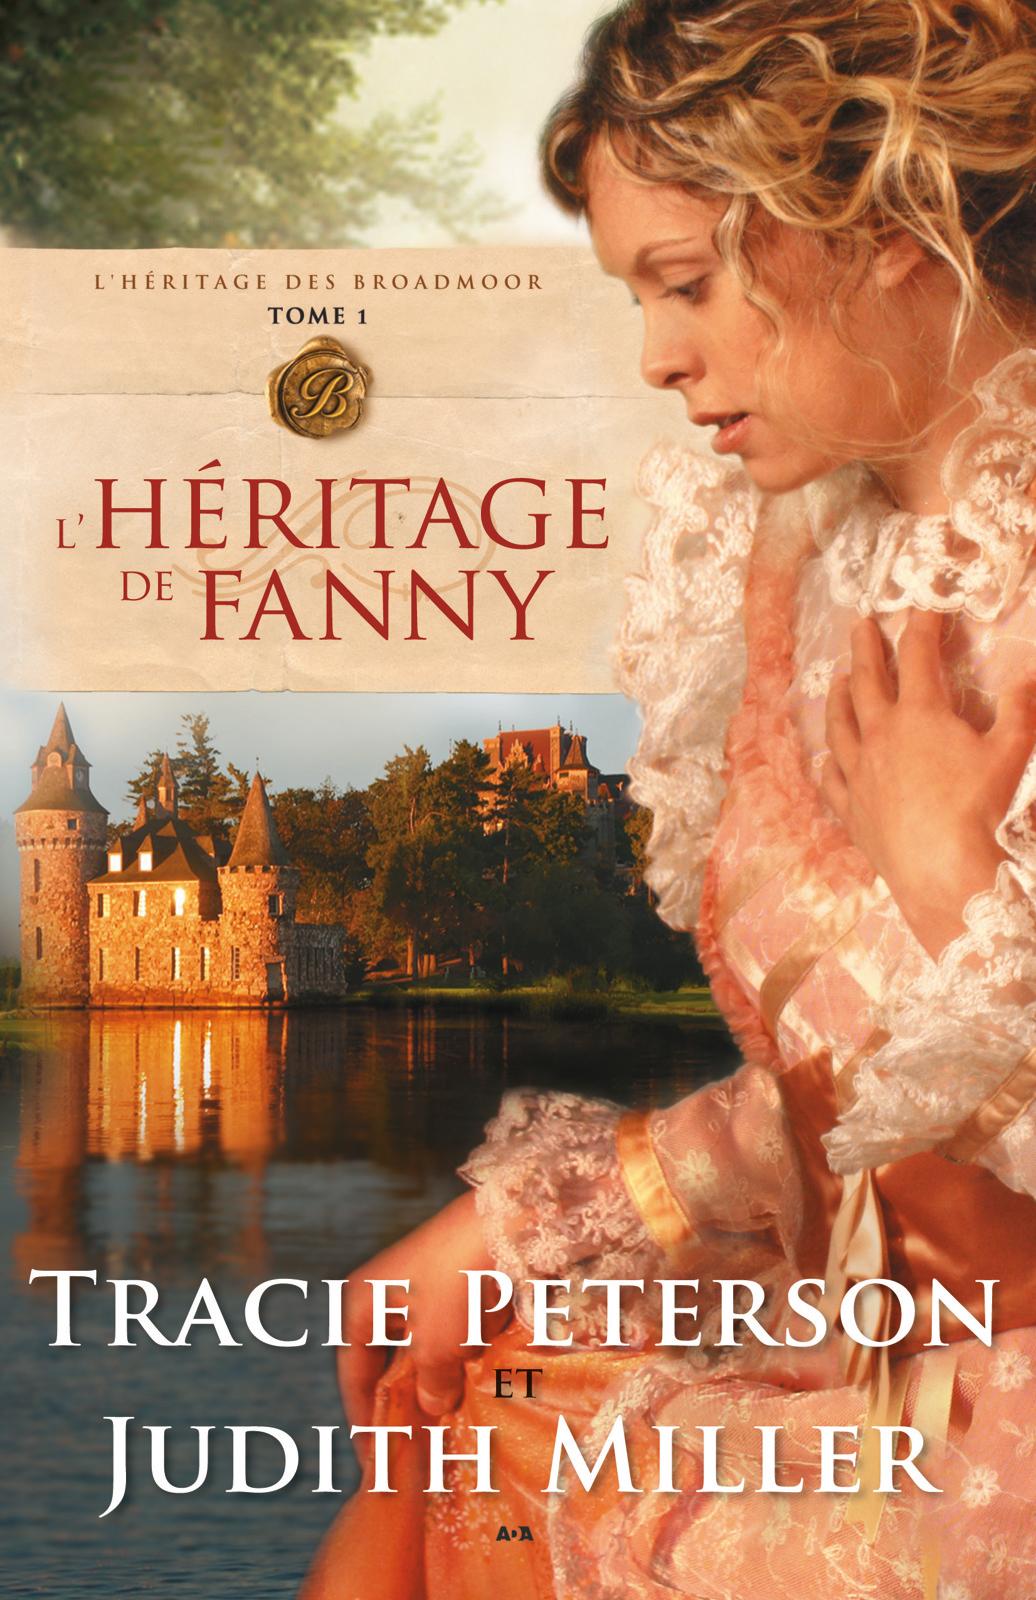 L'héritage de Fanny, L'héritage de Fanny